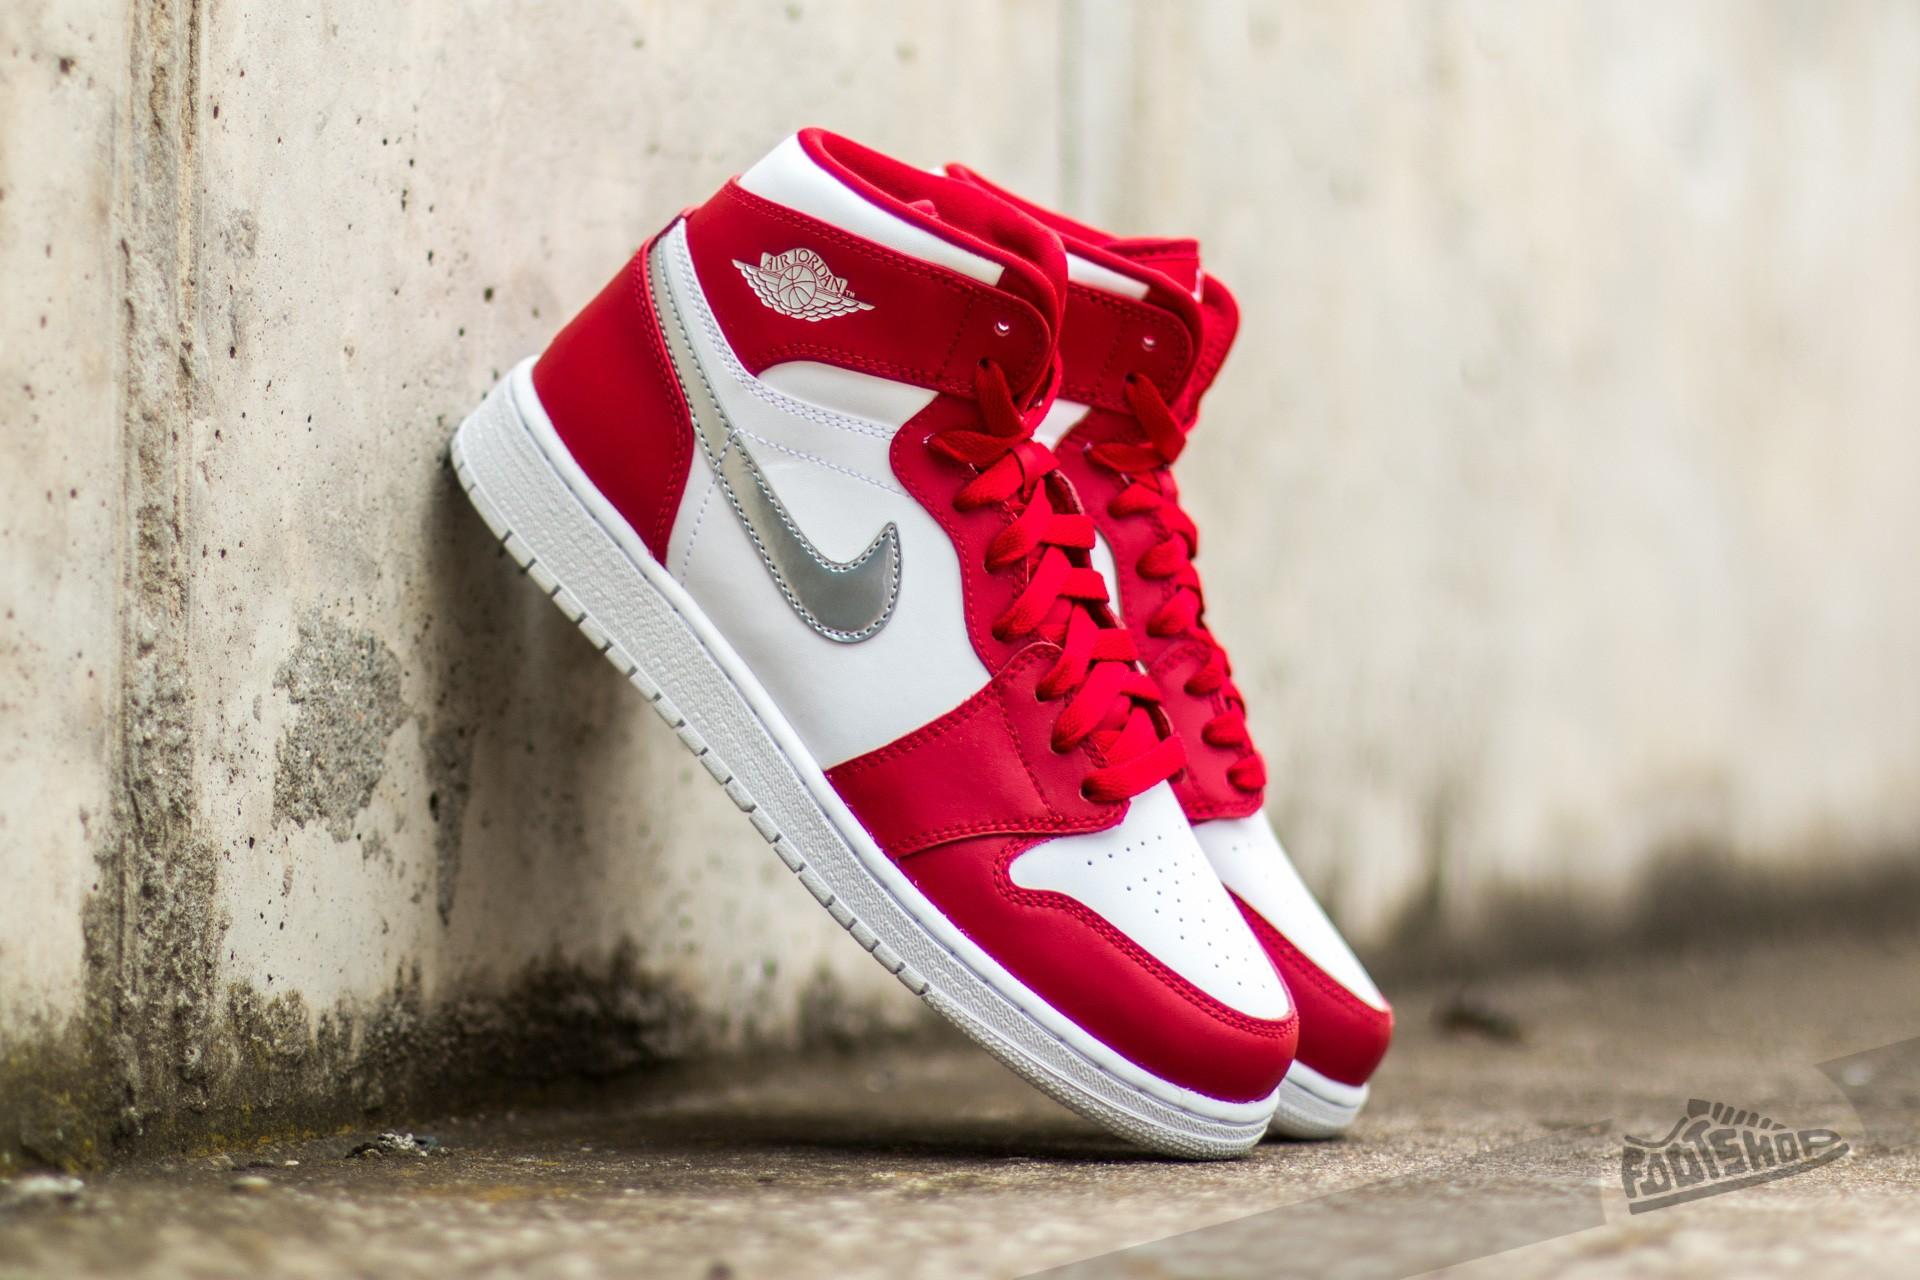 Air Jordan 1 Retro High (BG) Gym Red/ Metallic Silver-White